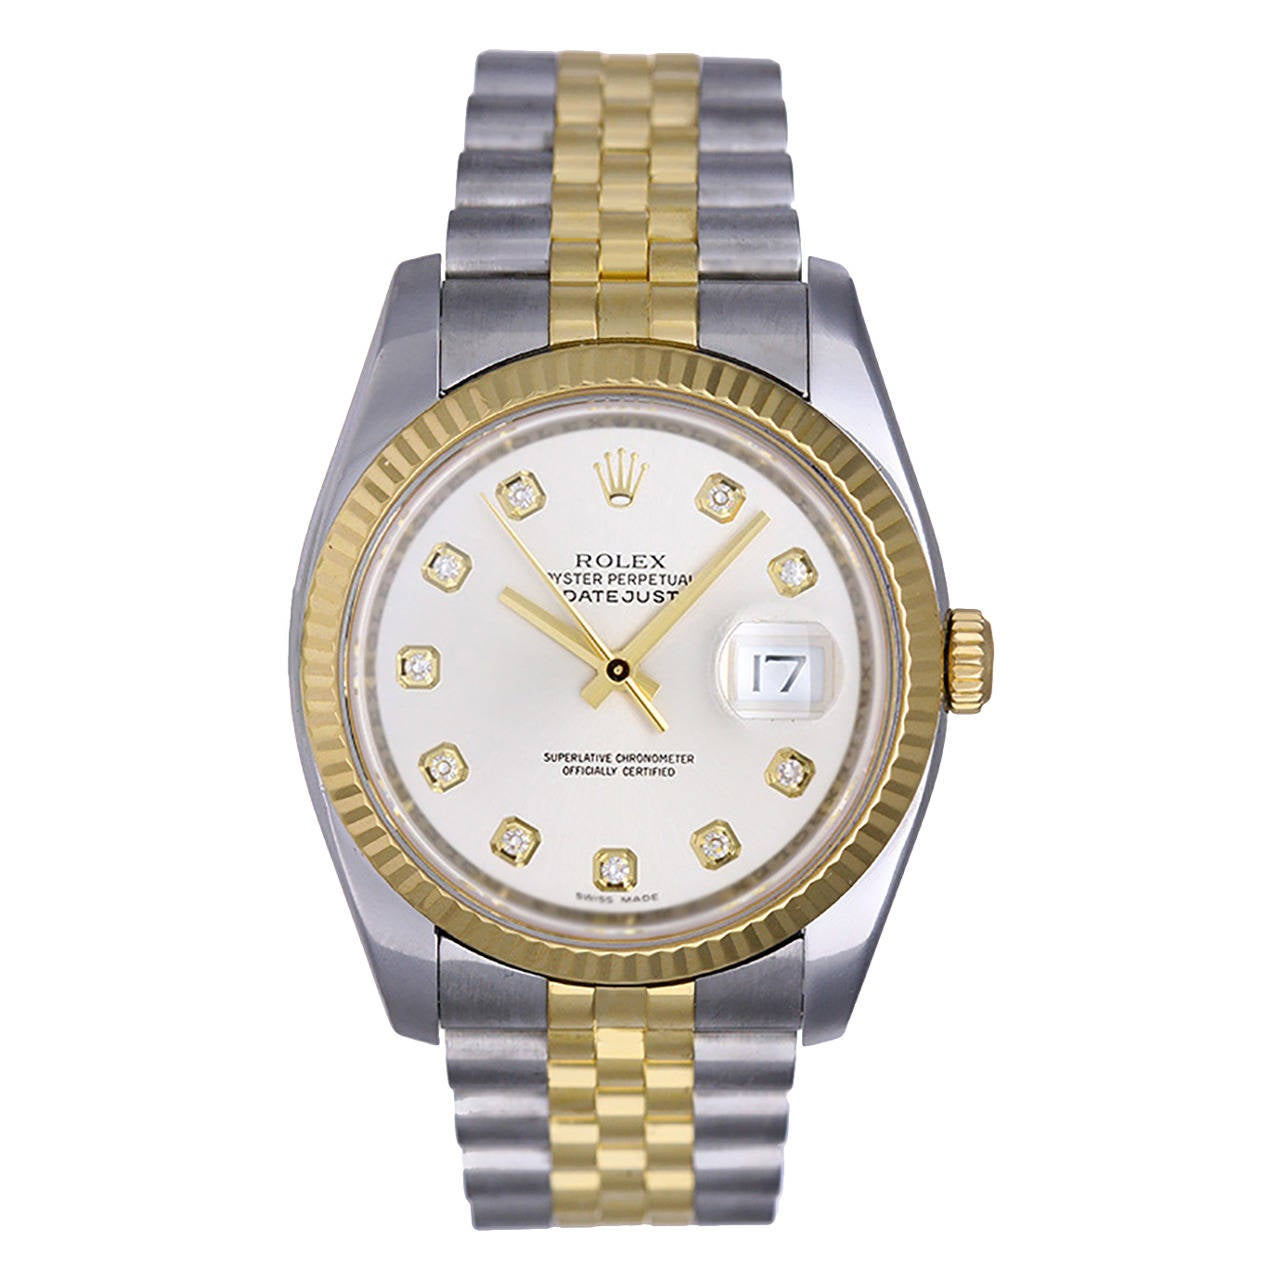 Rolex Stainless Steel Gold Datejust Diamond Dial Wristwatch Ref 116233 ...